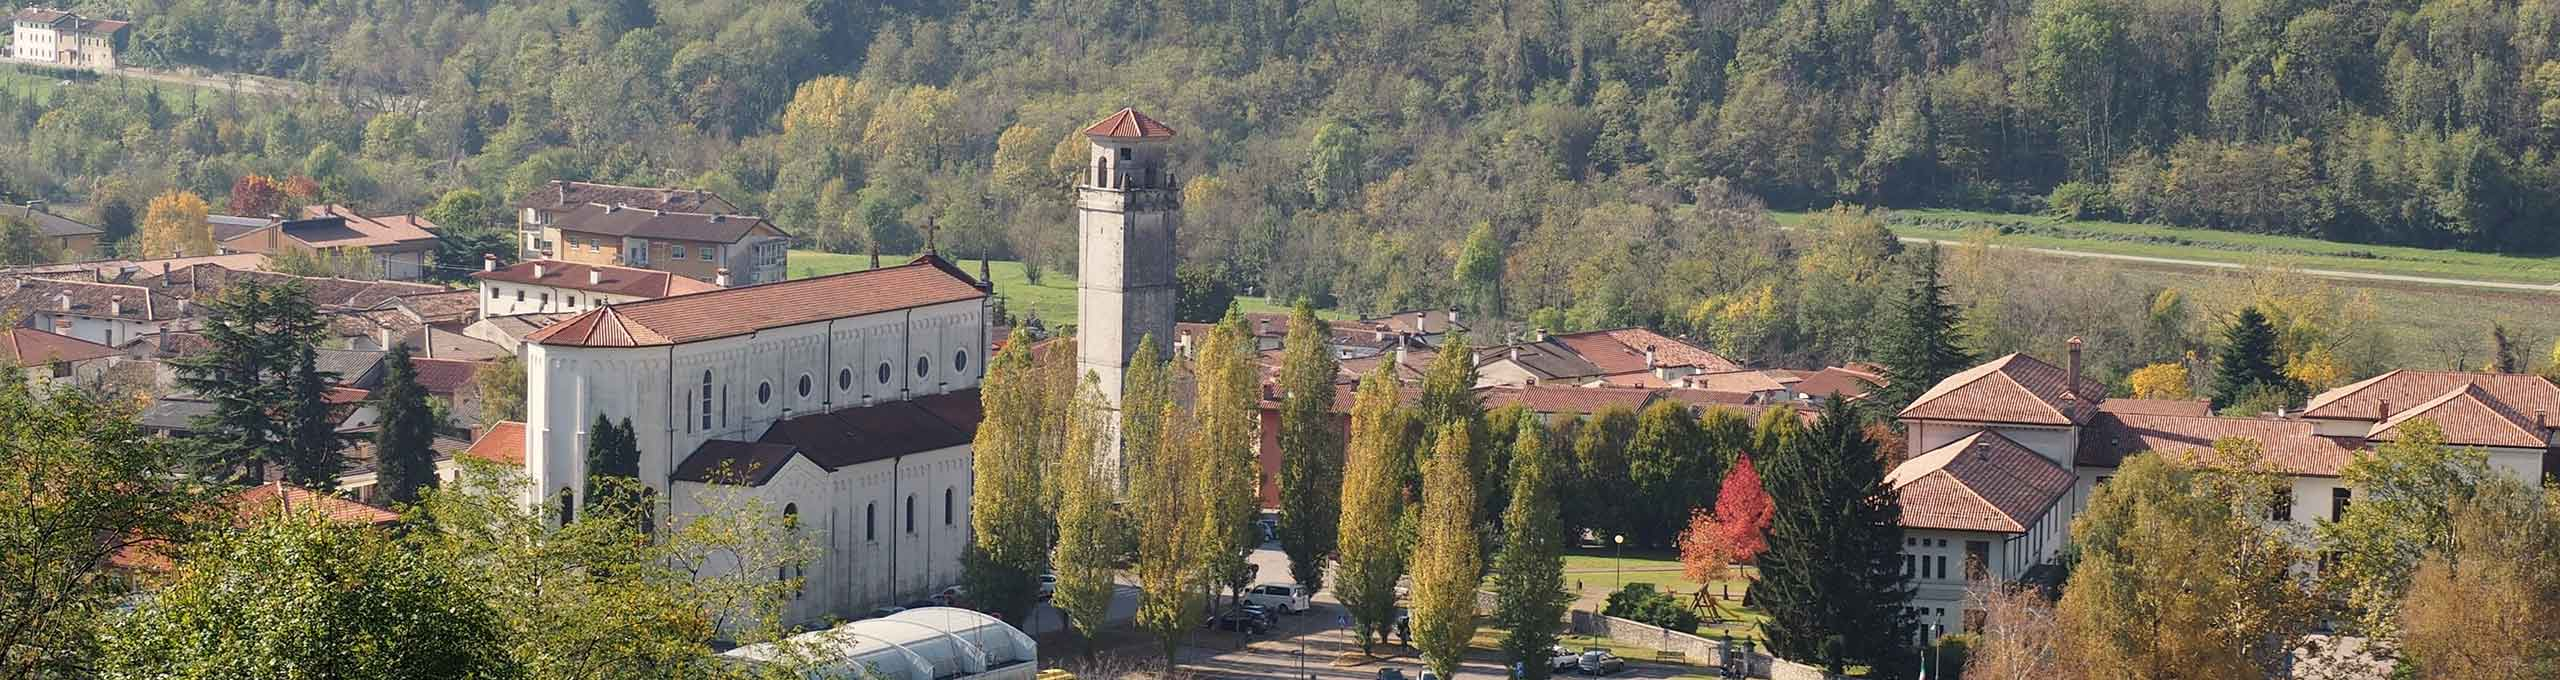 San Pietro al Natisone, Cividale e Valli Natisone Torre